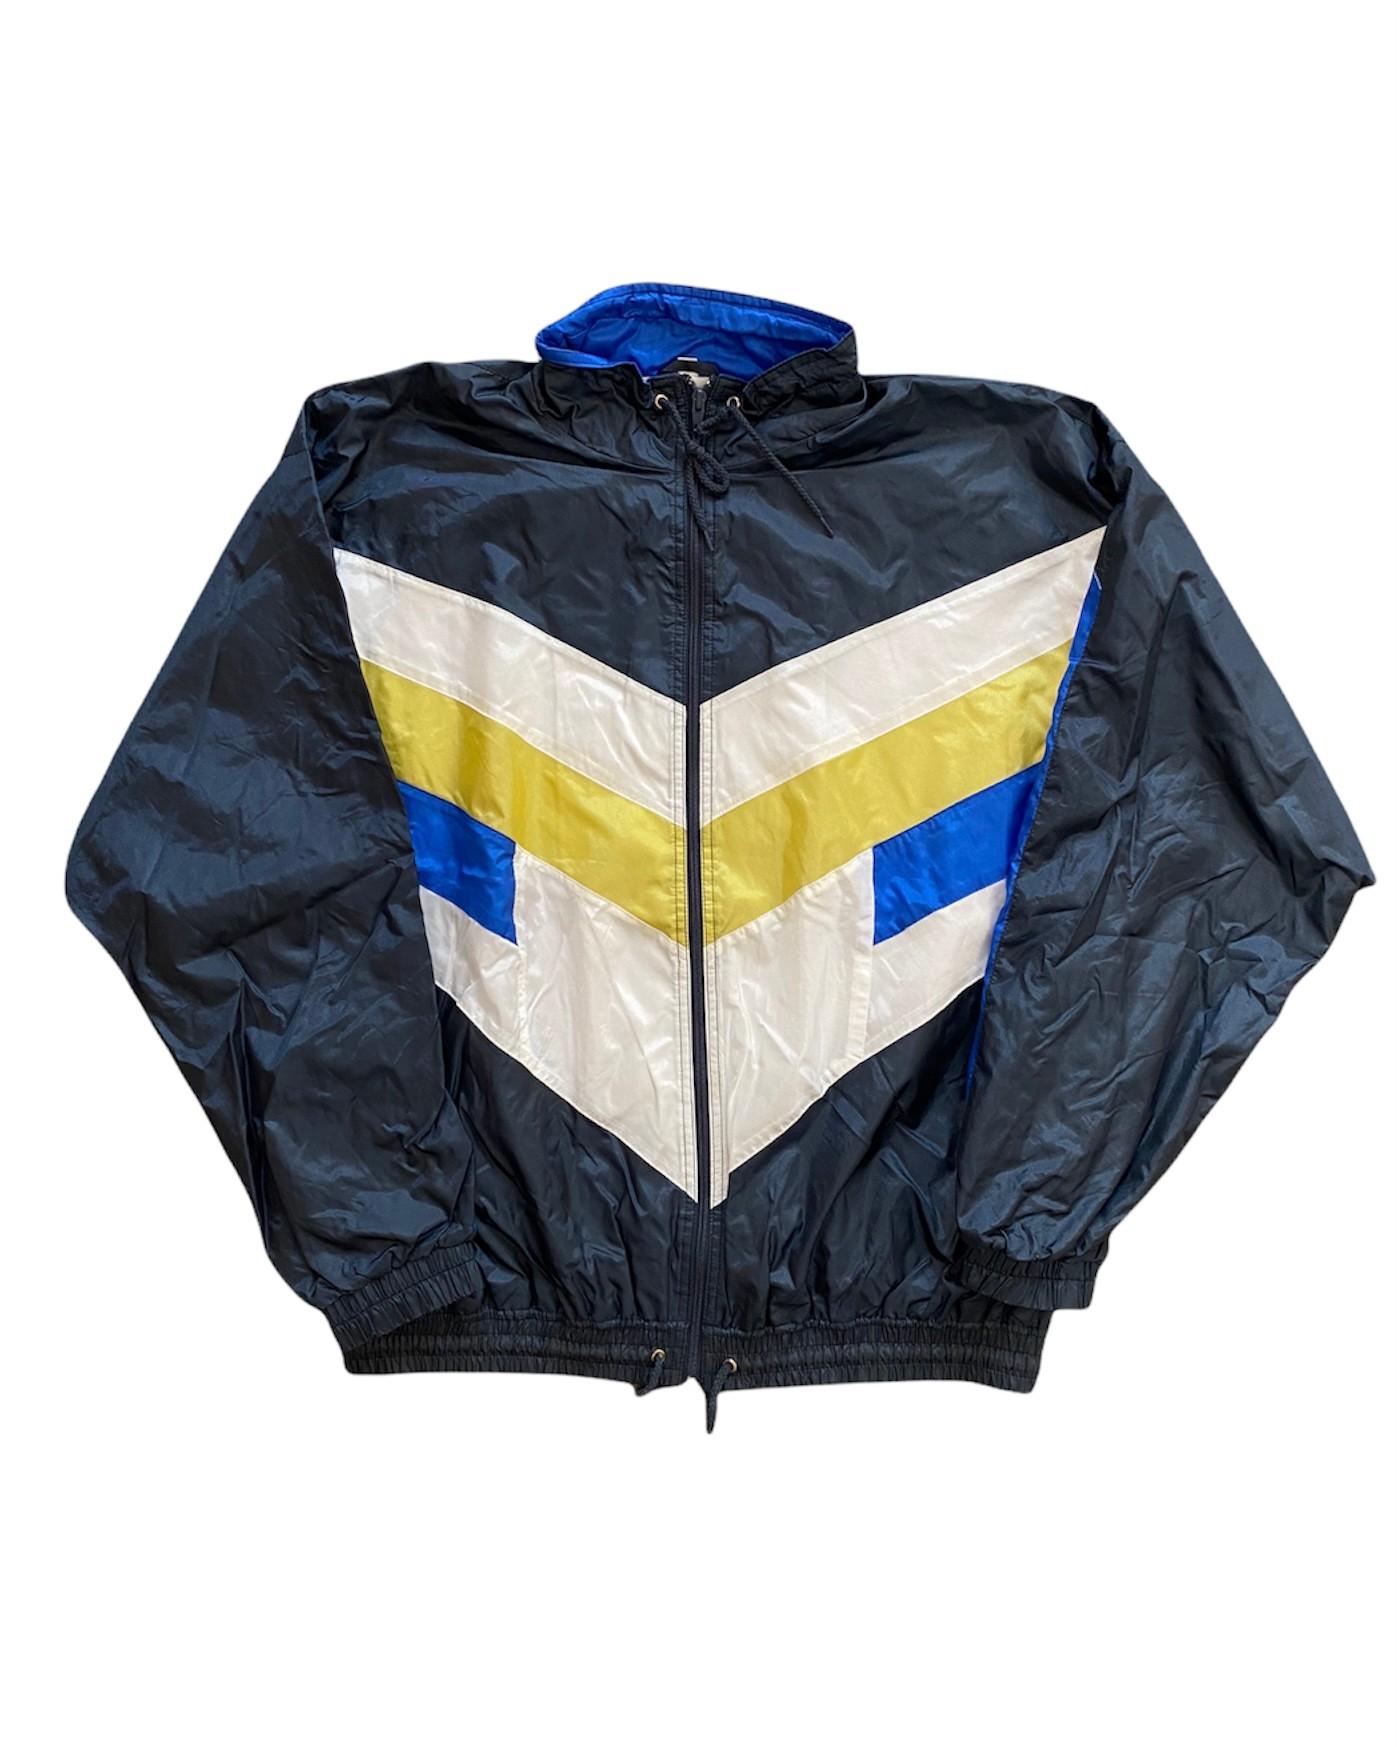 90's Old School Mevsimlik Ceket (XL)